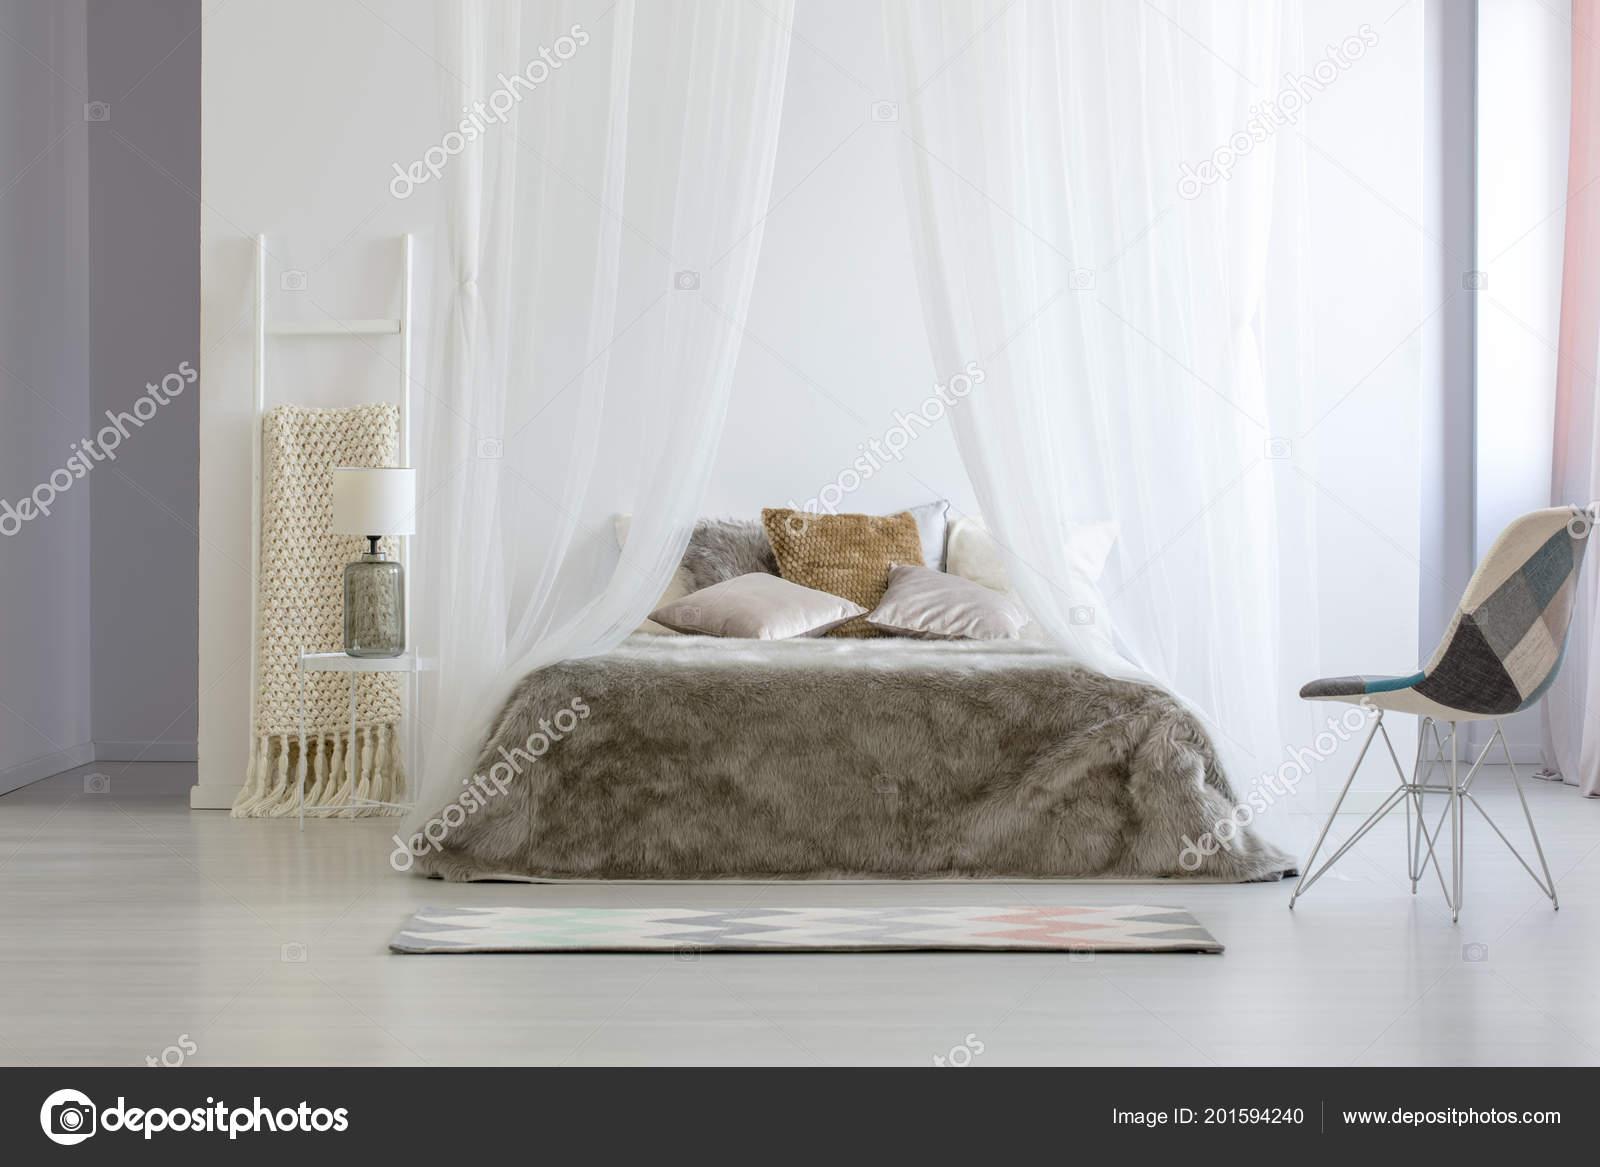 Chair Pattern Standing White Bedroom Interior Blanket Ladder Glass Lamp Stock Photo C Photographee Eu 201594240